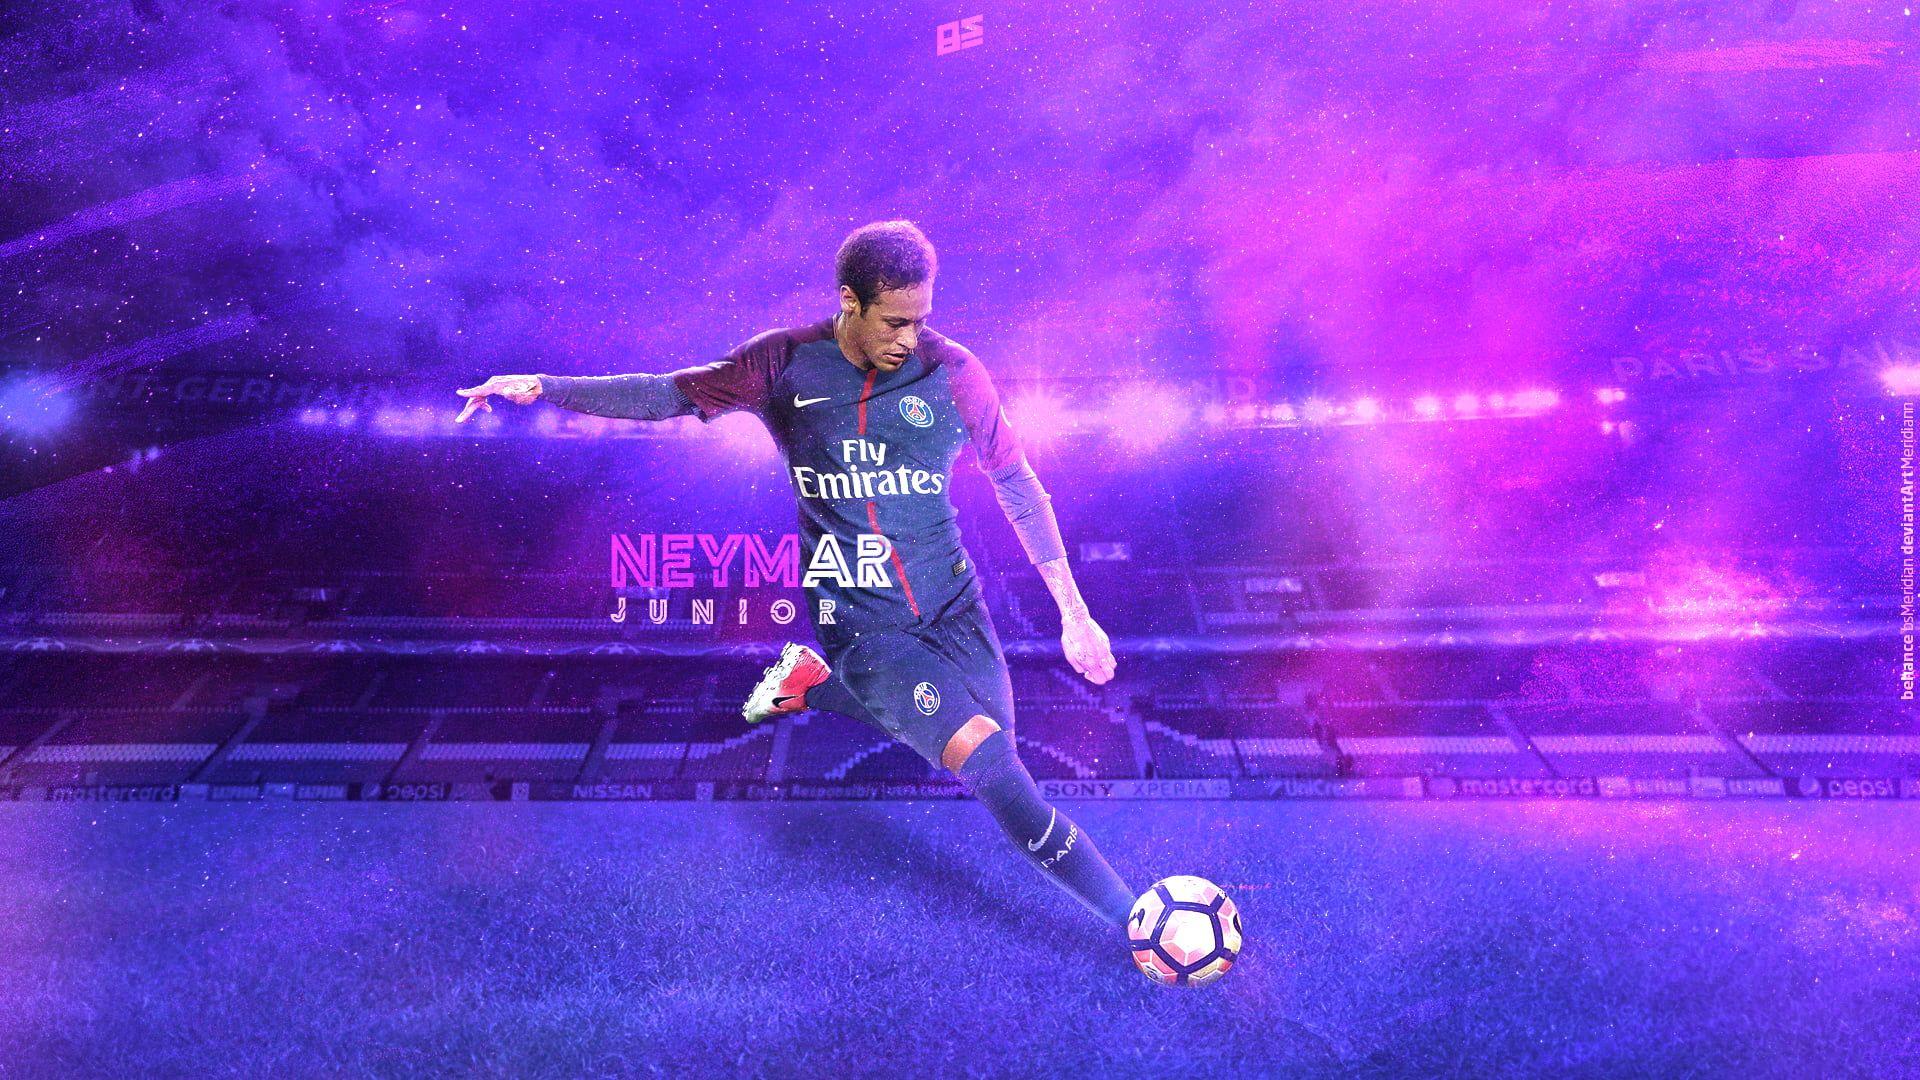 Neymar Junior Fly Emirates Wallpaper Neymar Jr Neymar Paris Saint Germain P S G Soccer 1080p Wallpaper Hdwallpape Neymar Jr Neymar Jr Wallpapers Neymar